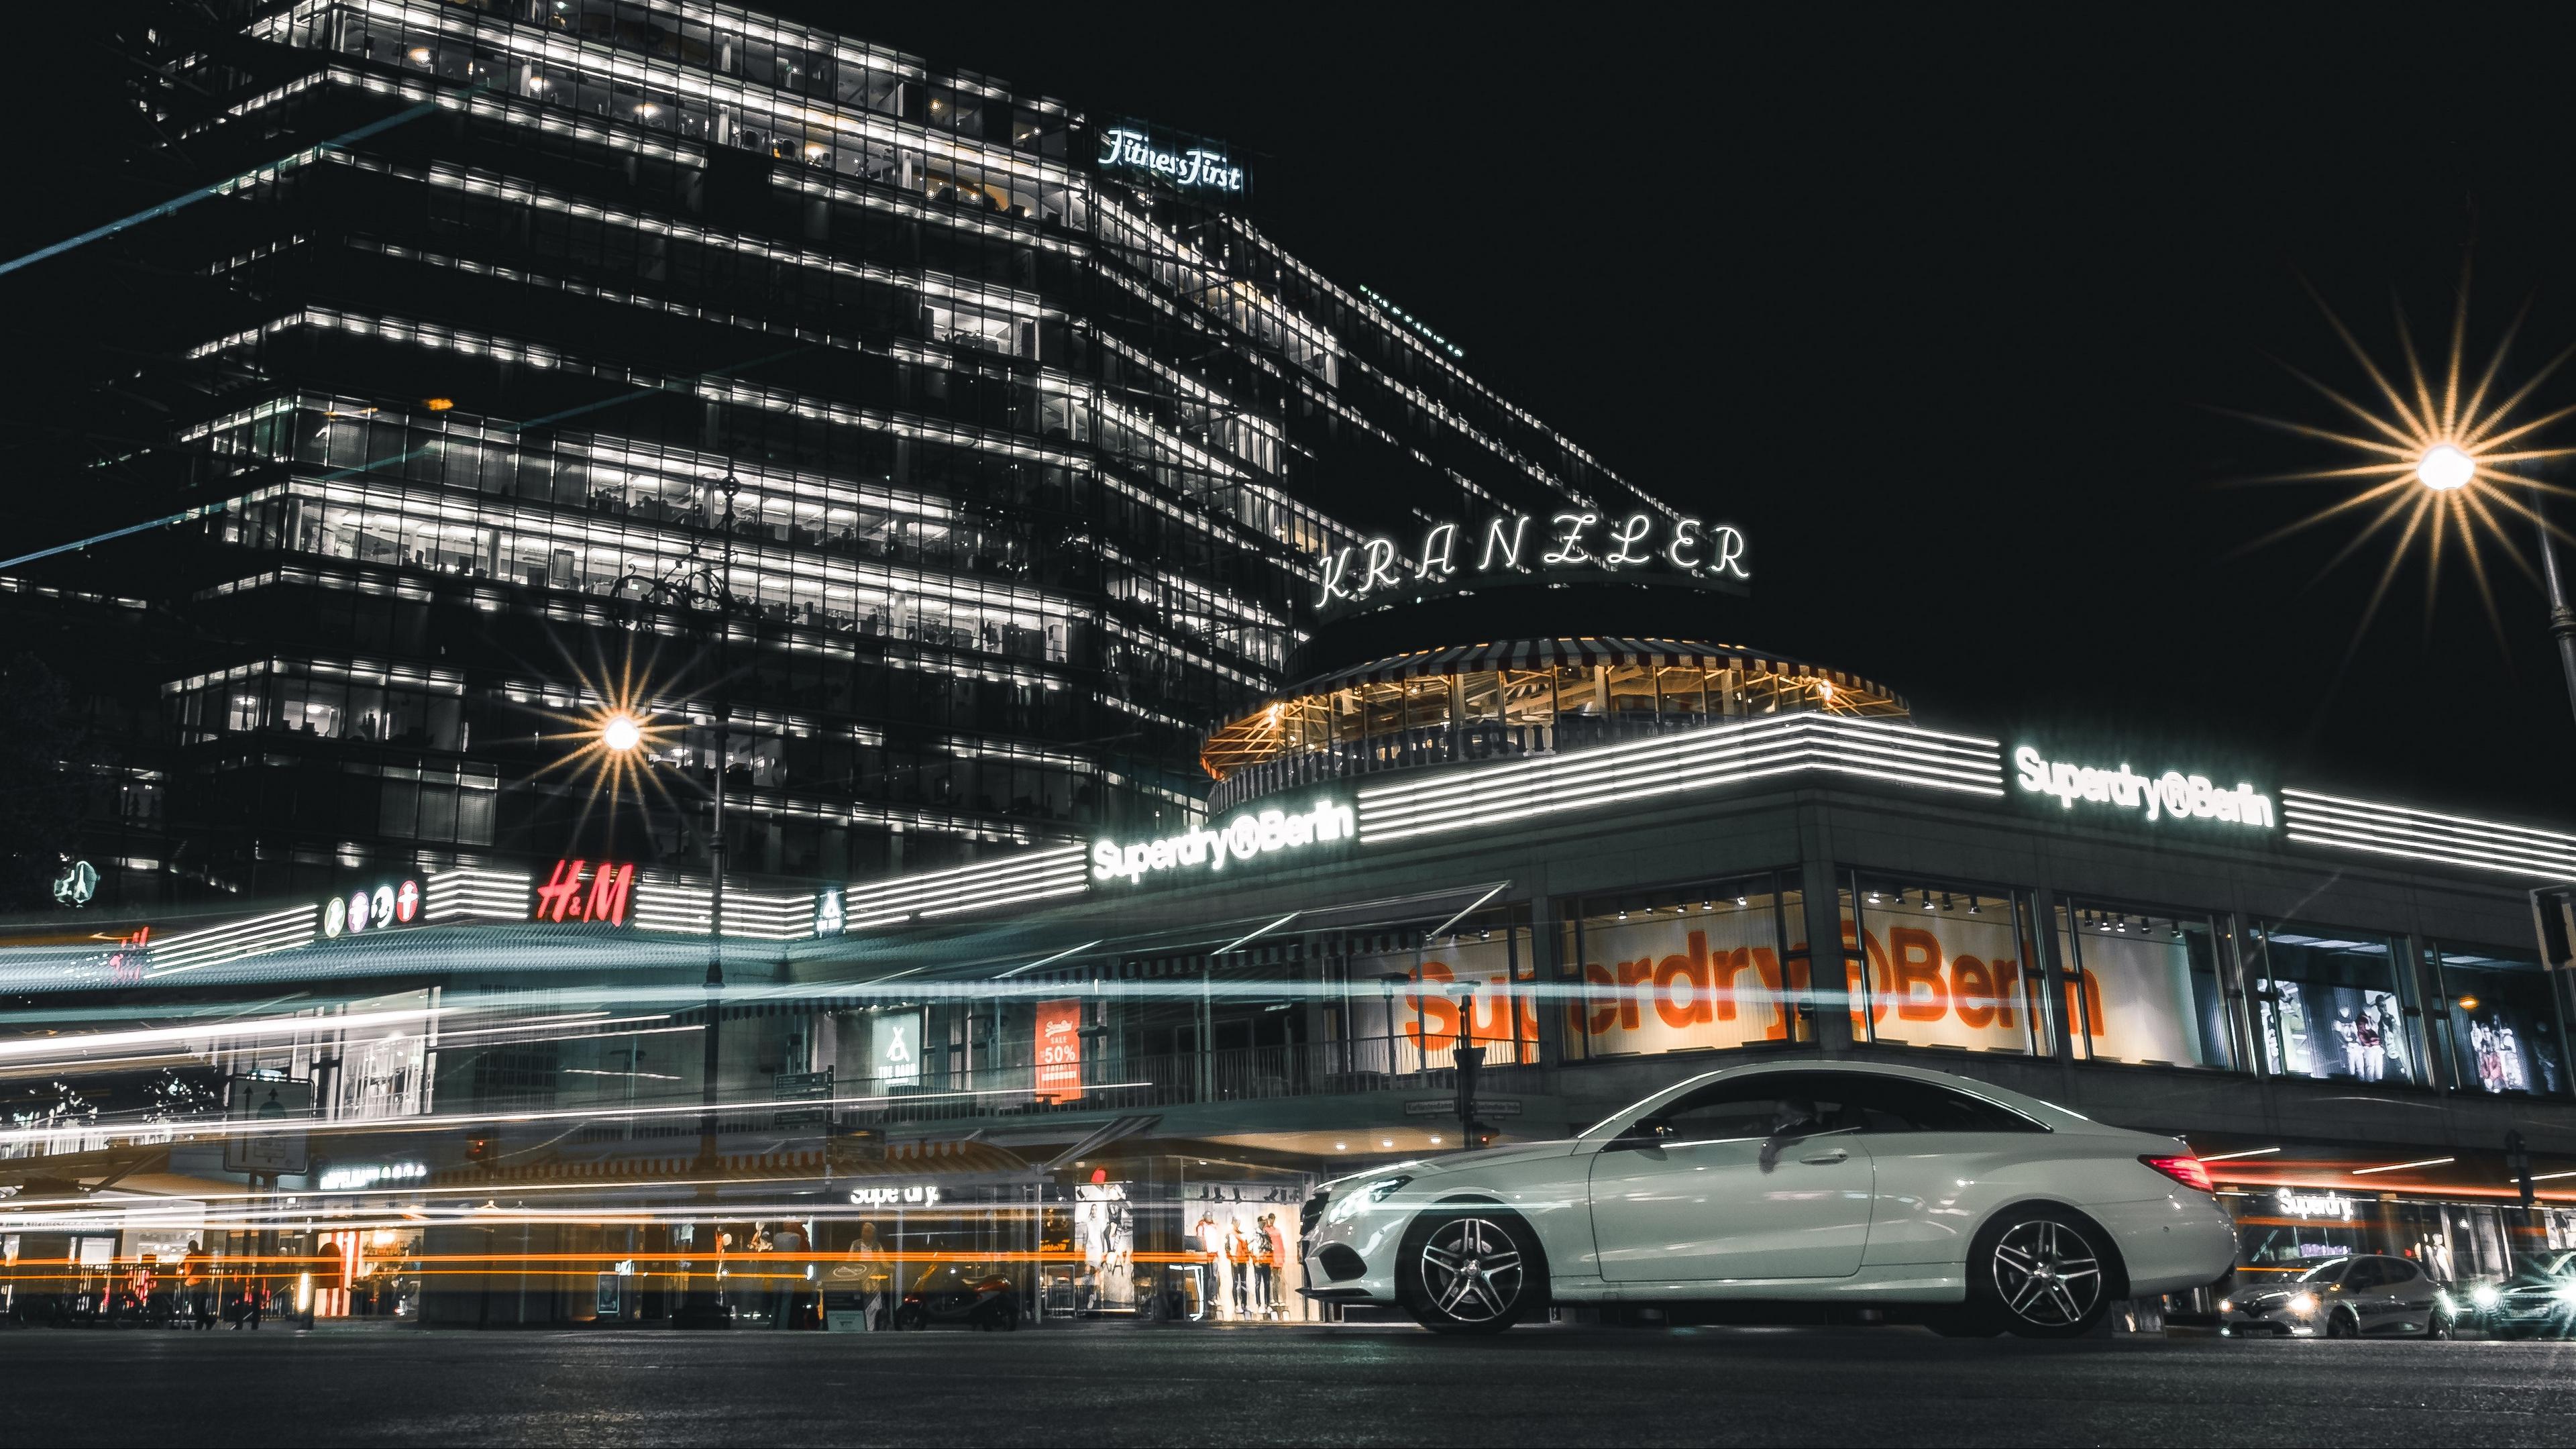 Download wallpaper 3840x2160 car night city street city lights 3840x2160